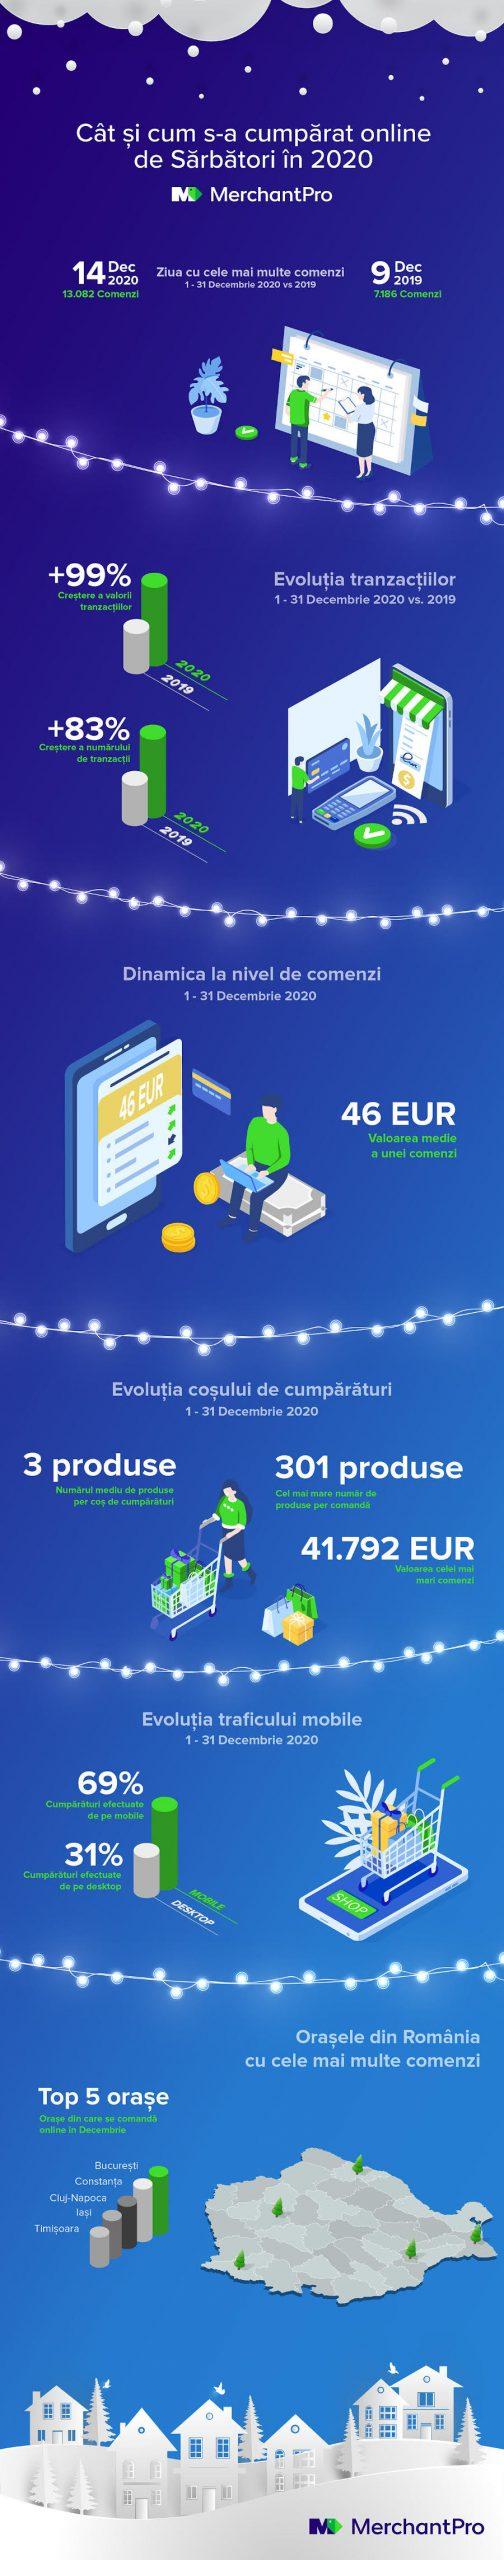 infografic merchantpro comert online